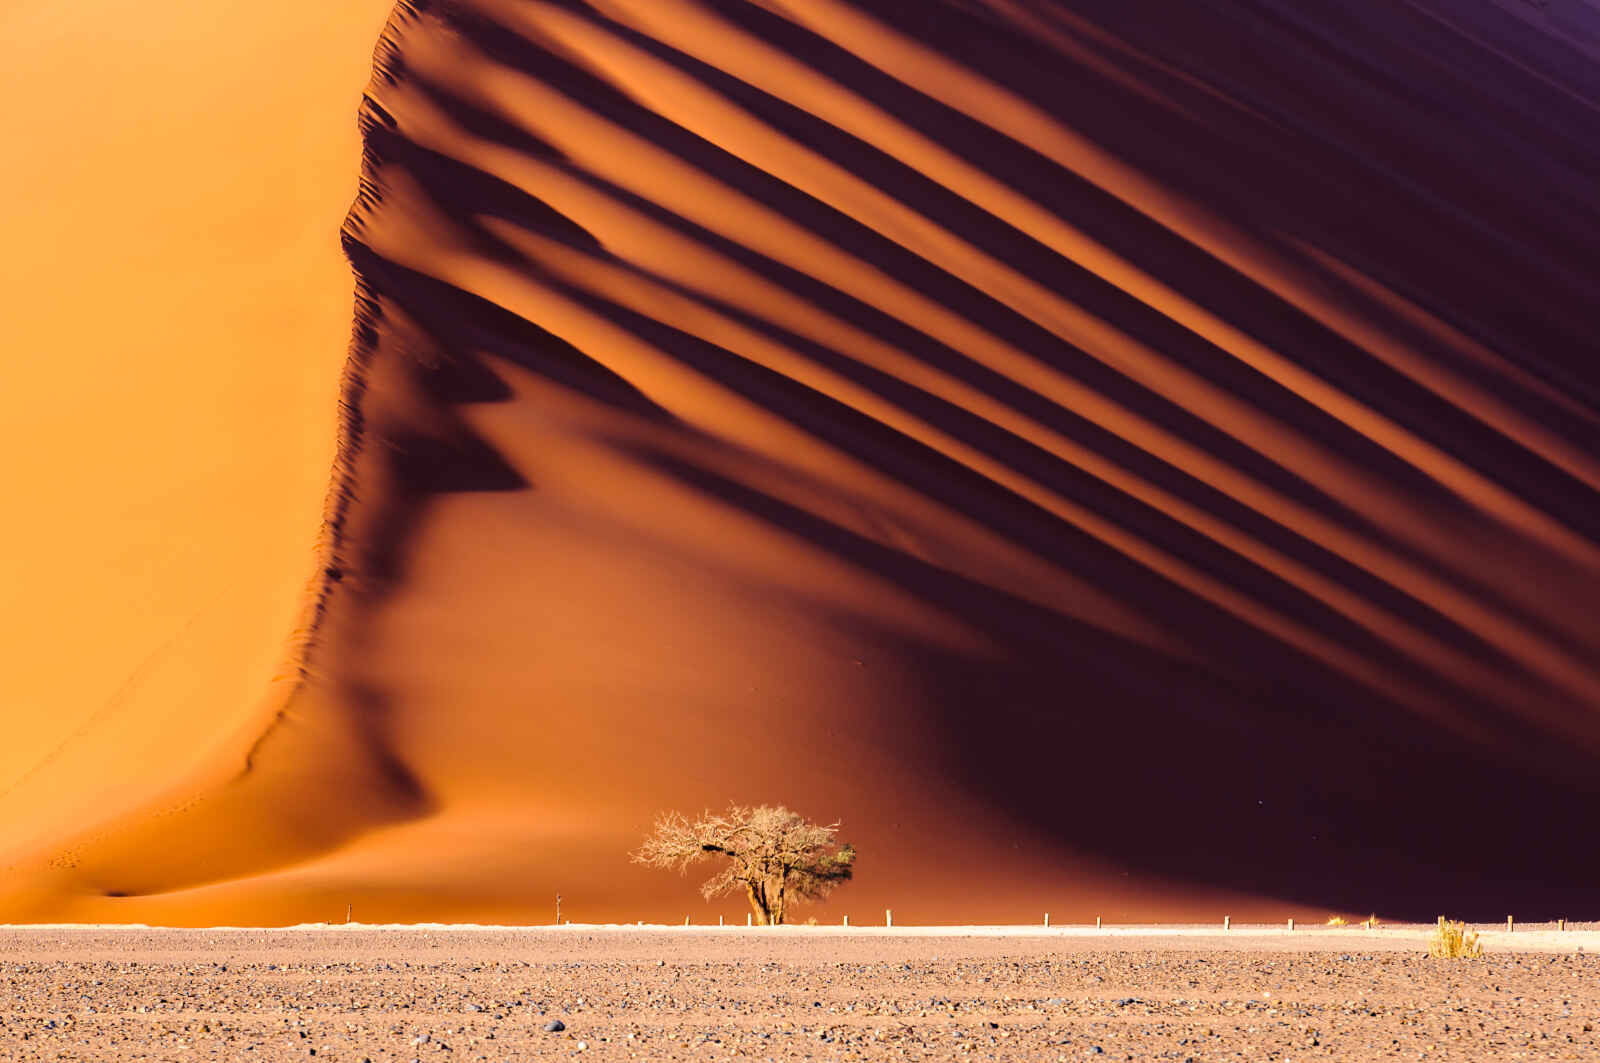 Namibie : Magnétique Namibie